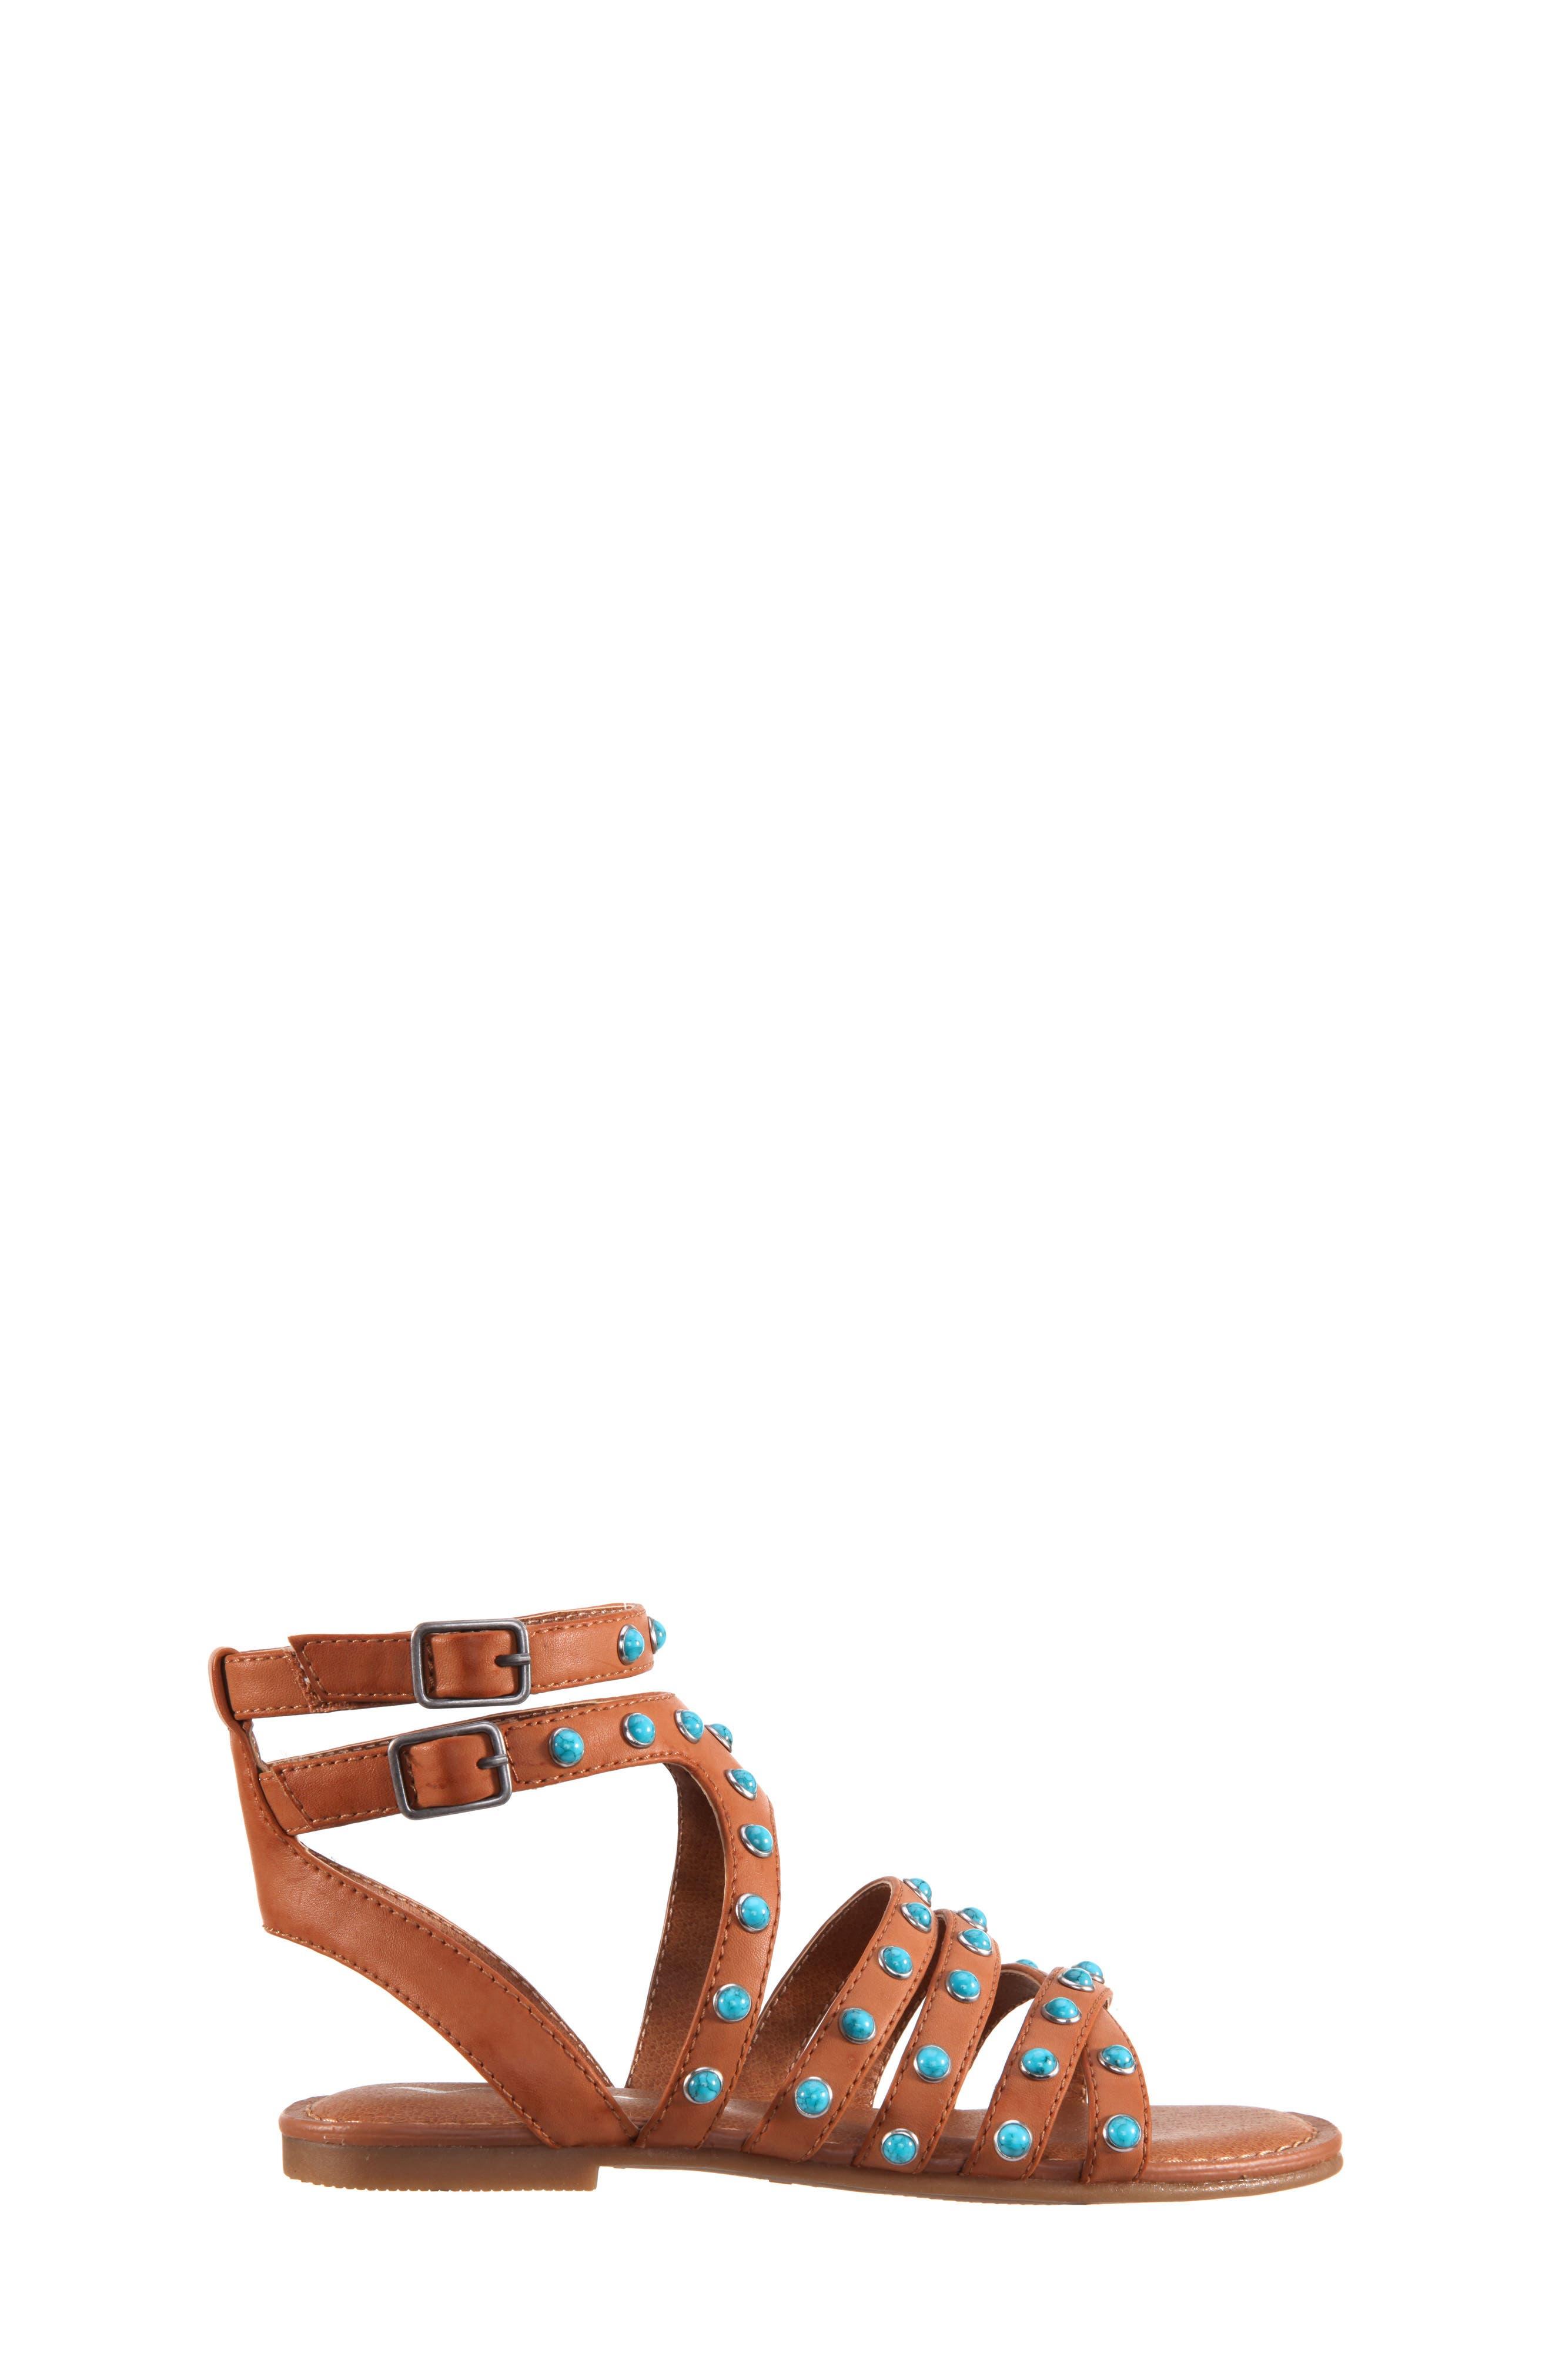 Tammara Studded Gladiator Sandal,                             Alternate thumbnail 3, color,                             Tan Burnished